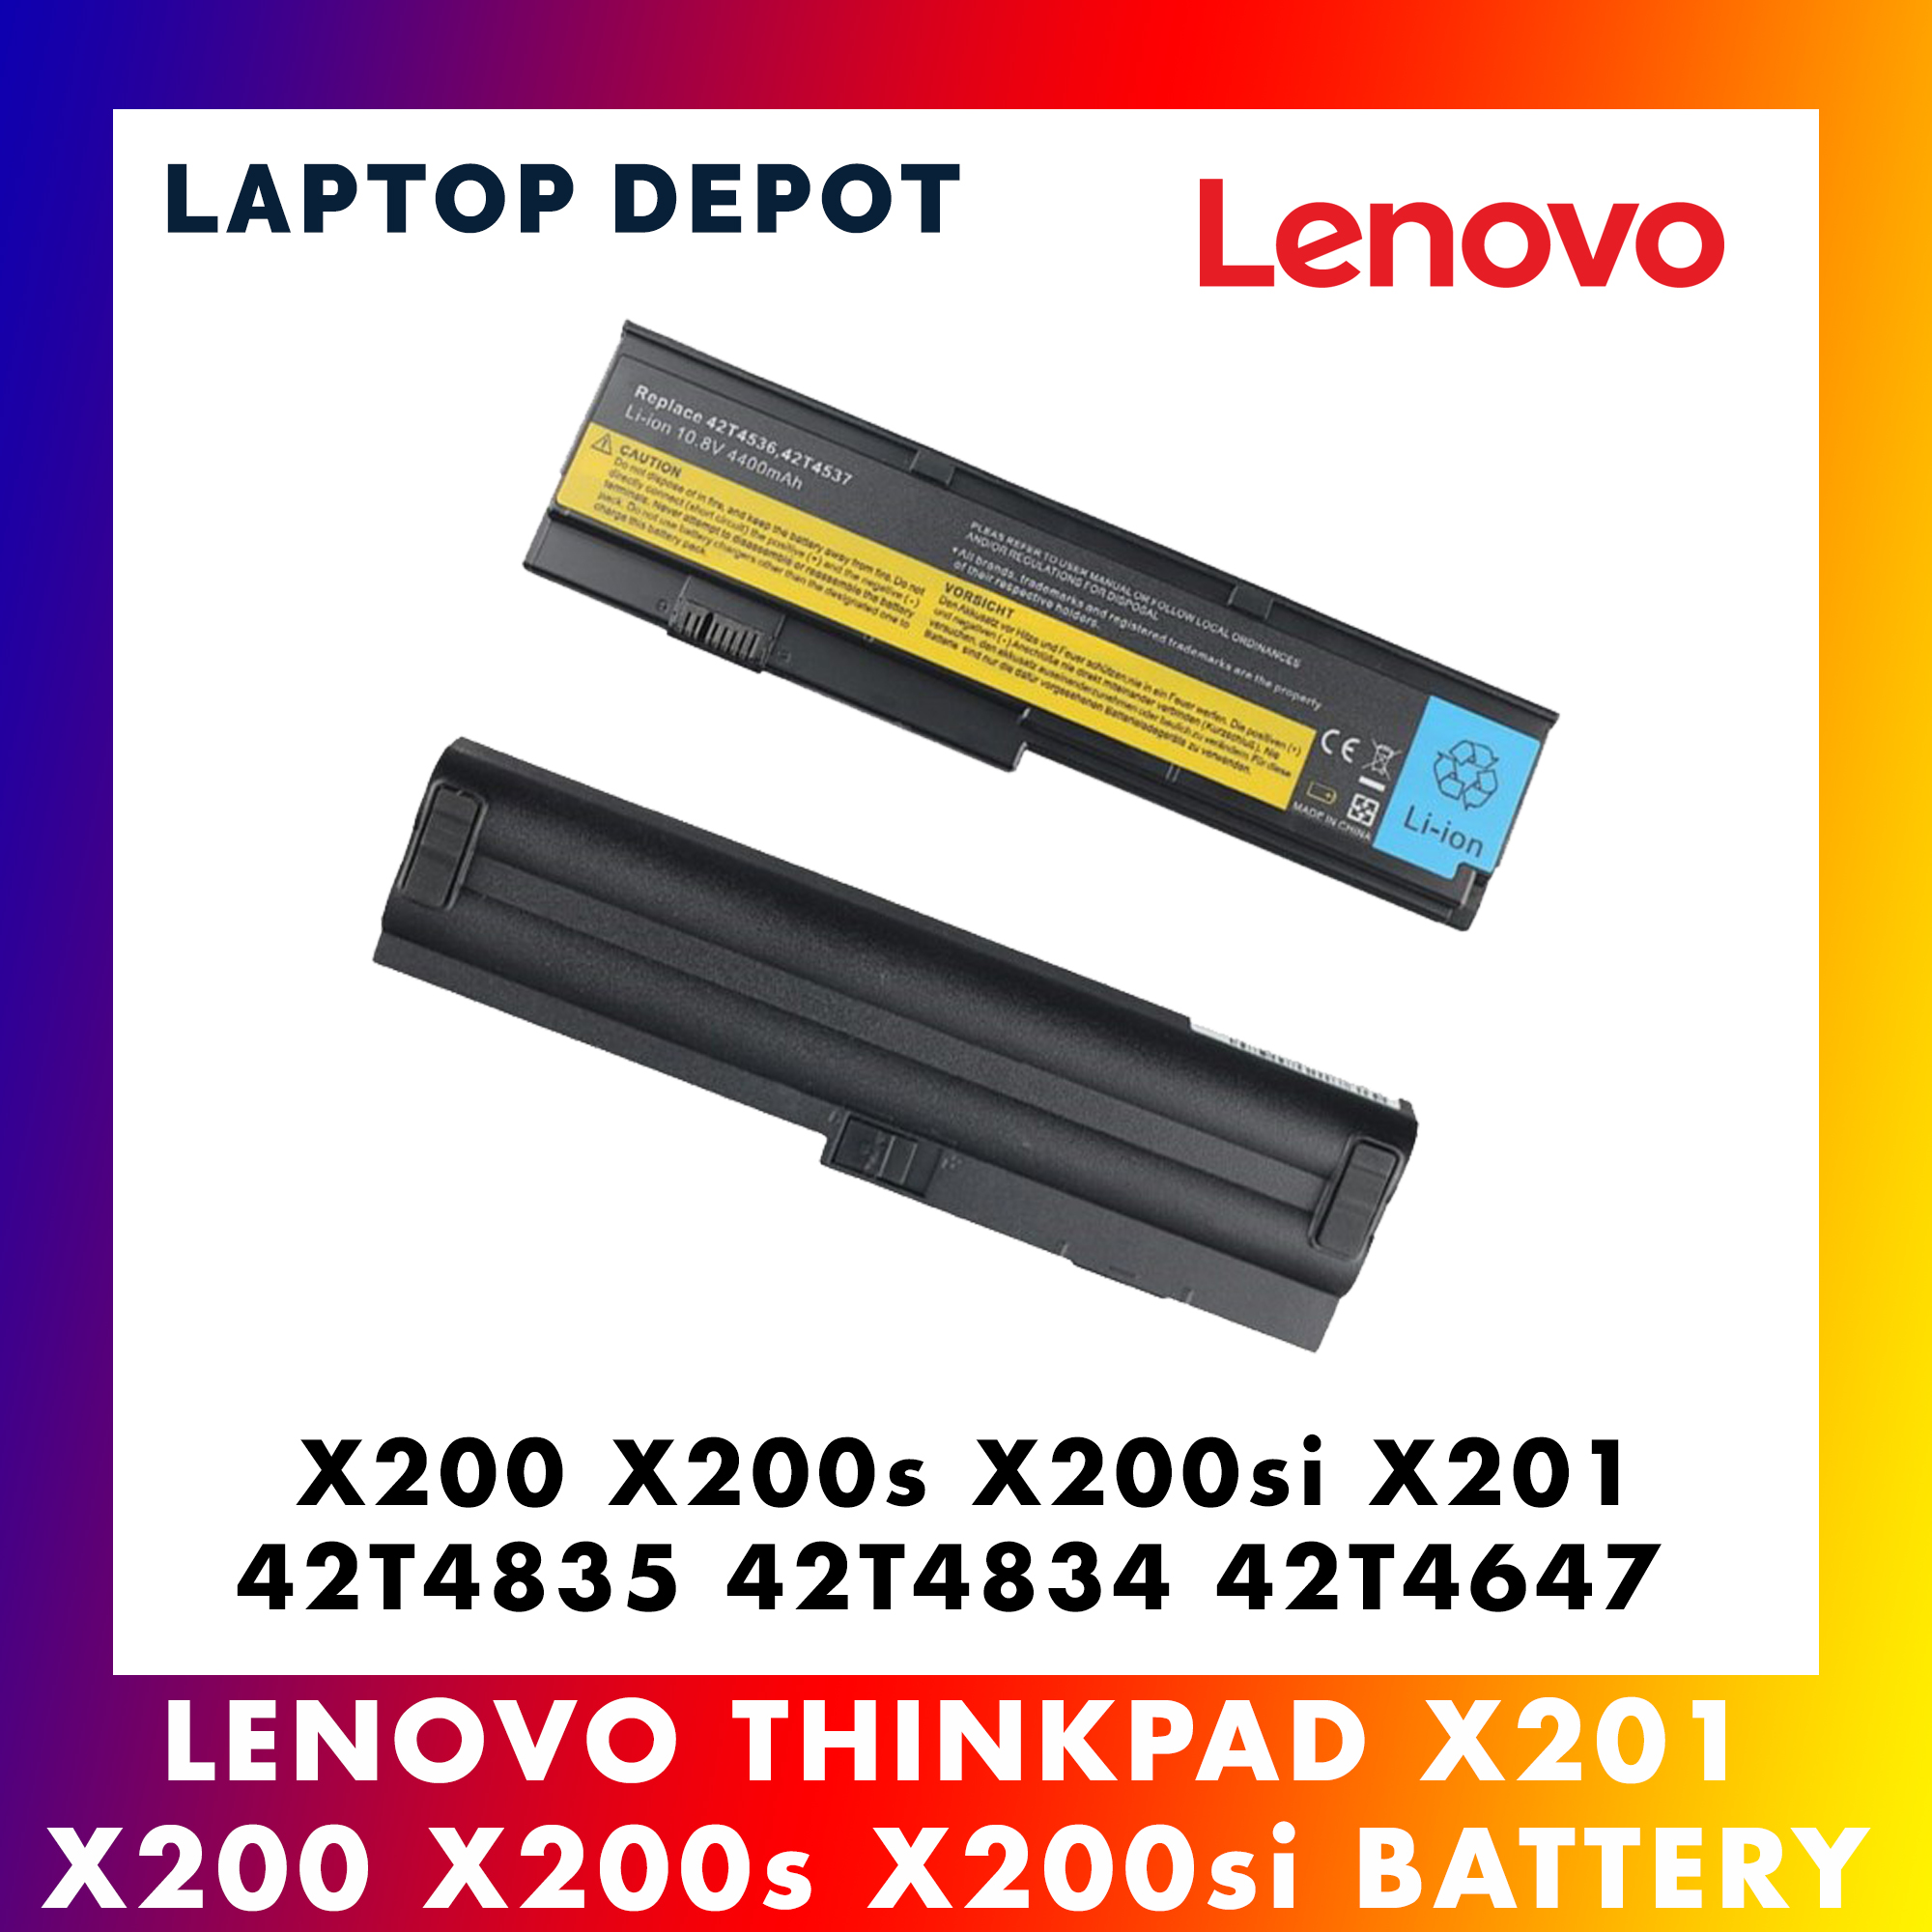 Lenovo Laptop Parts